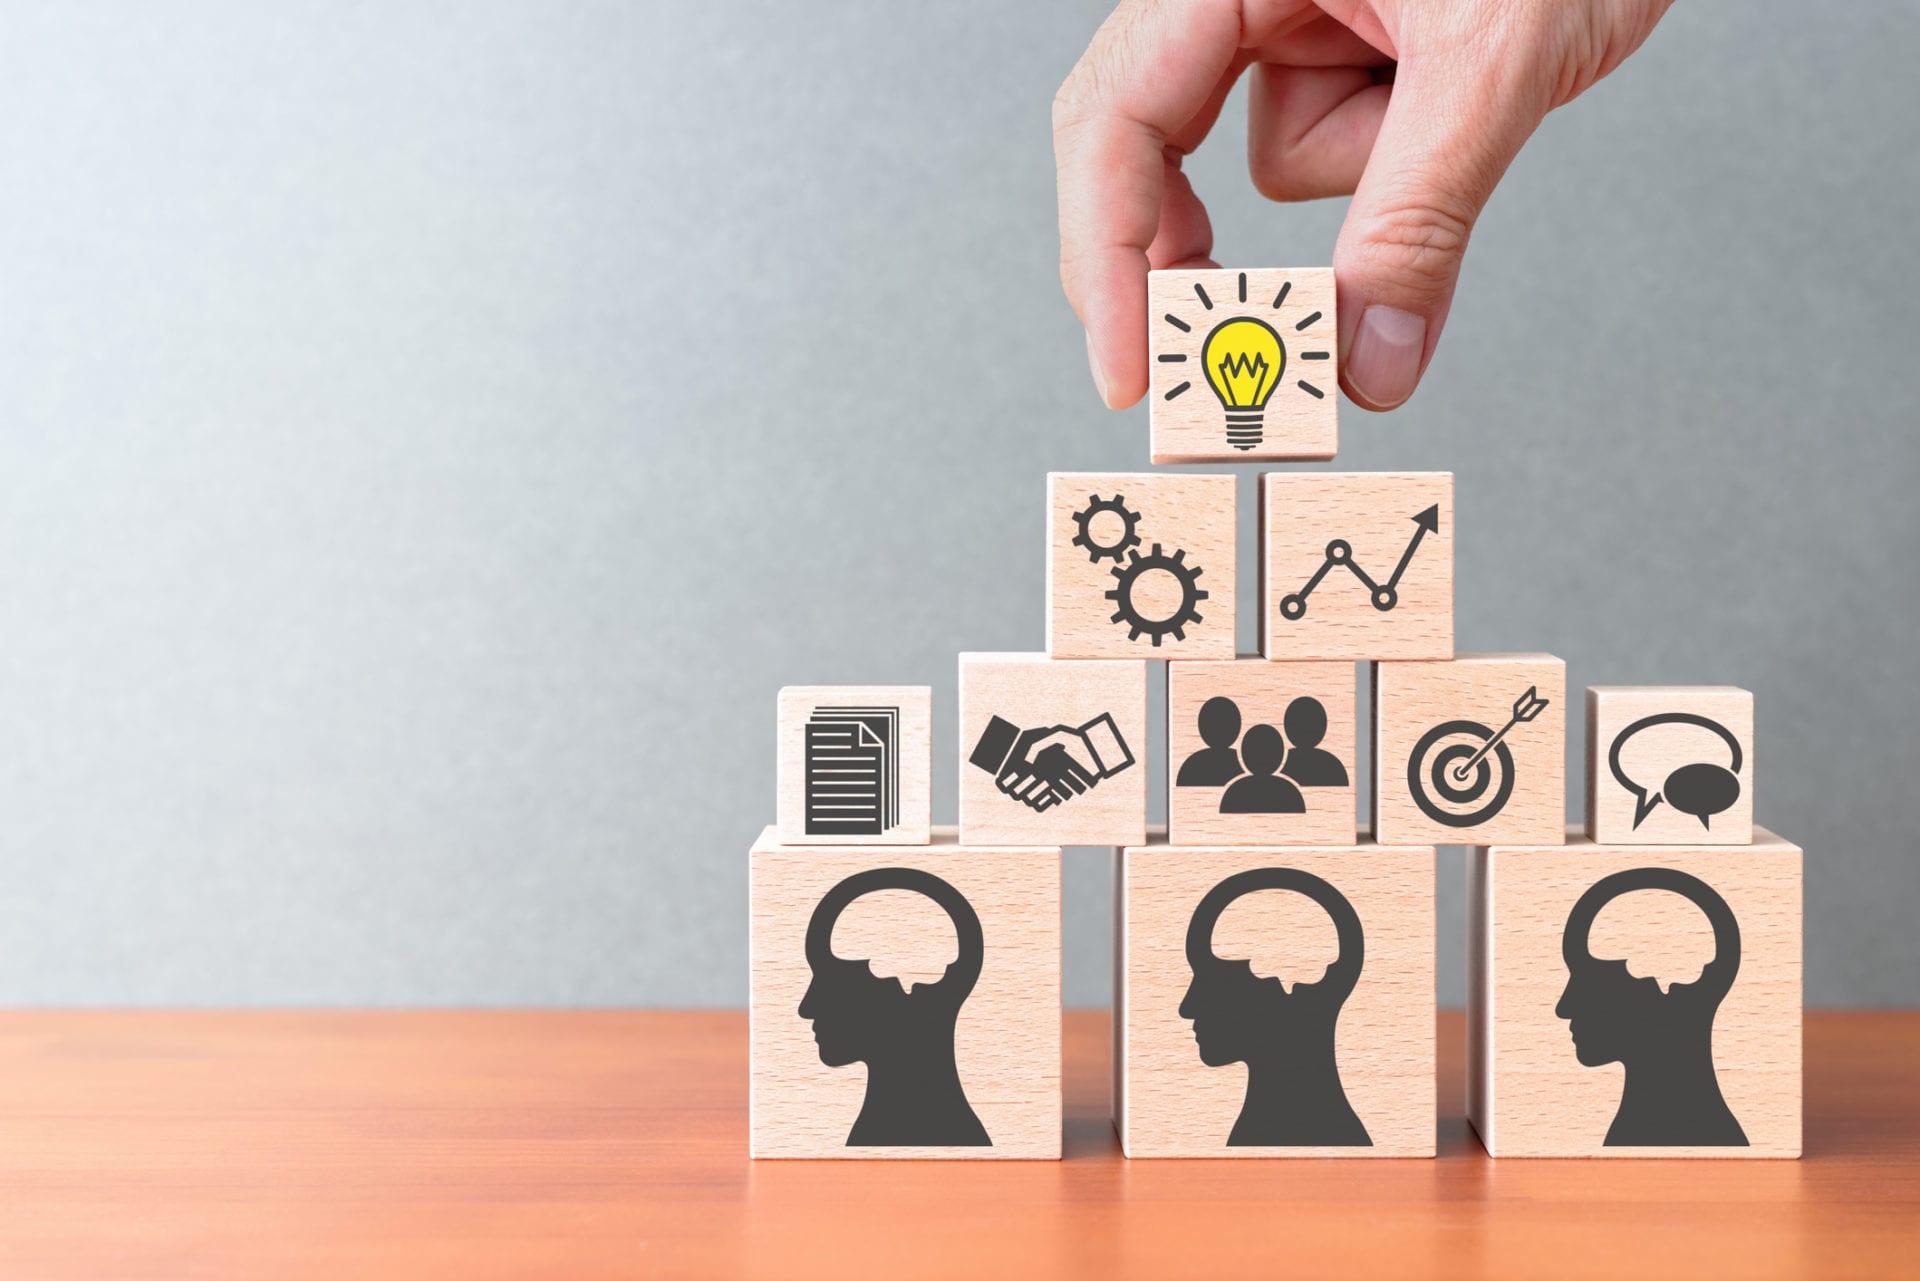 building blocks representing knowledge management framework